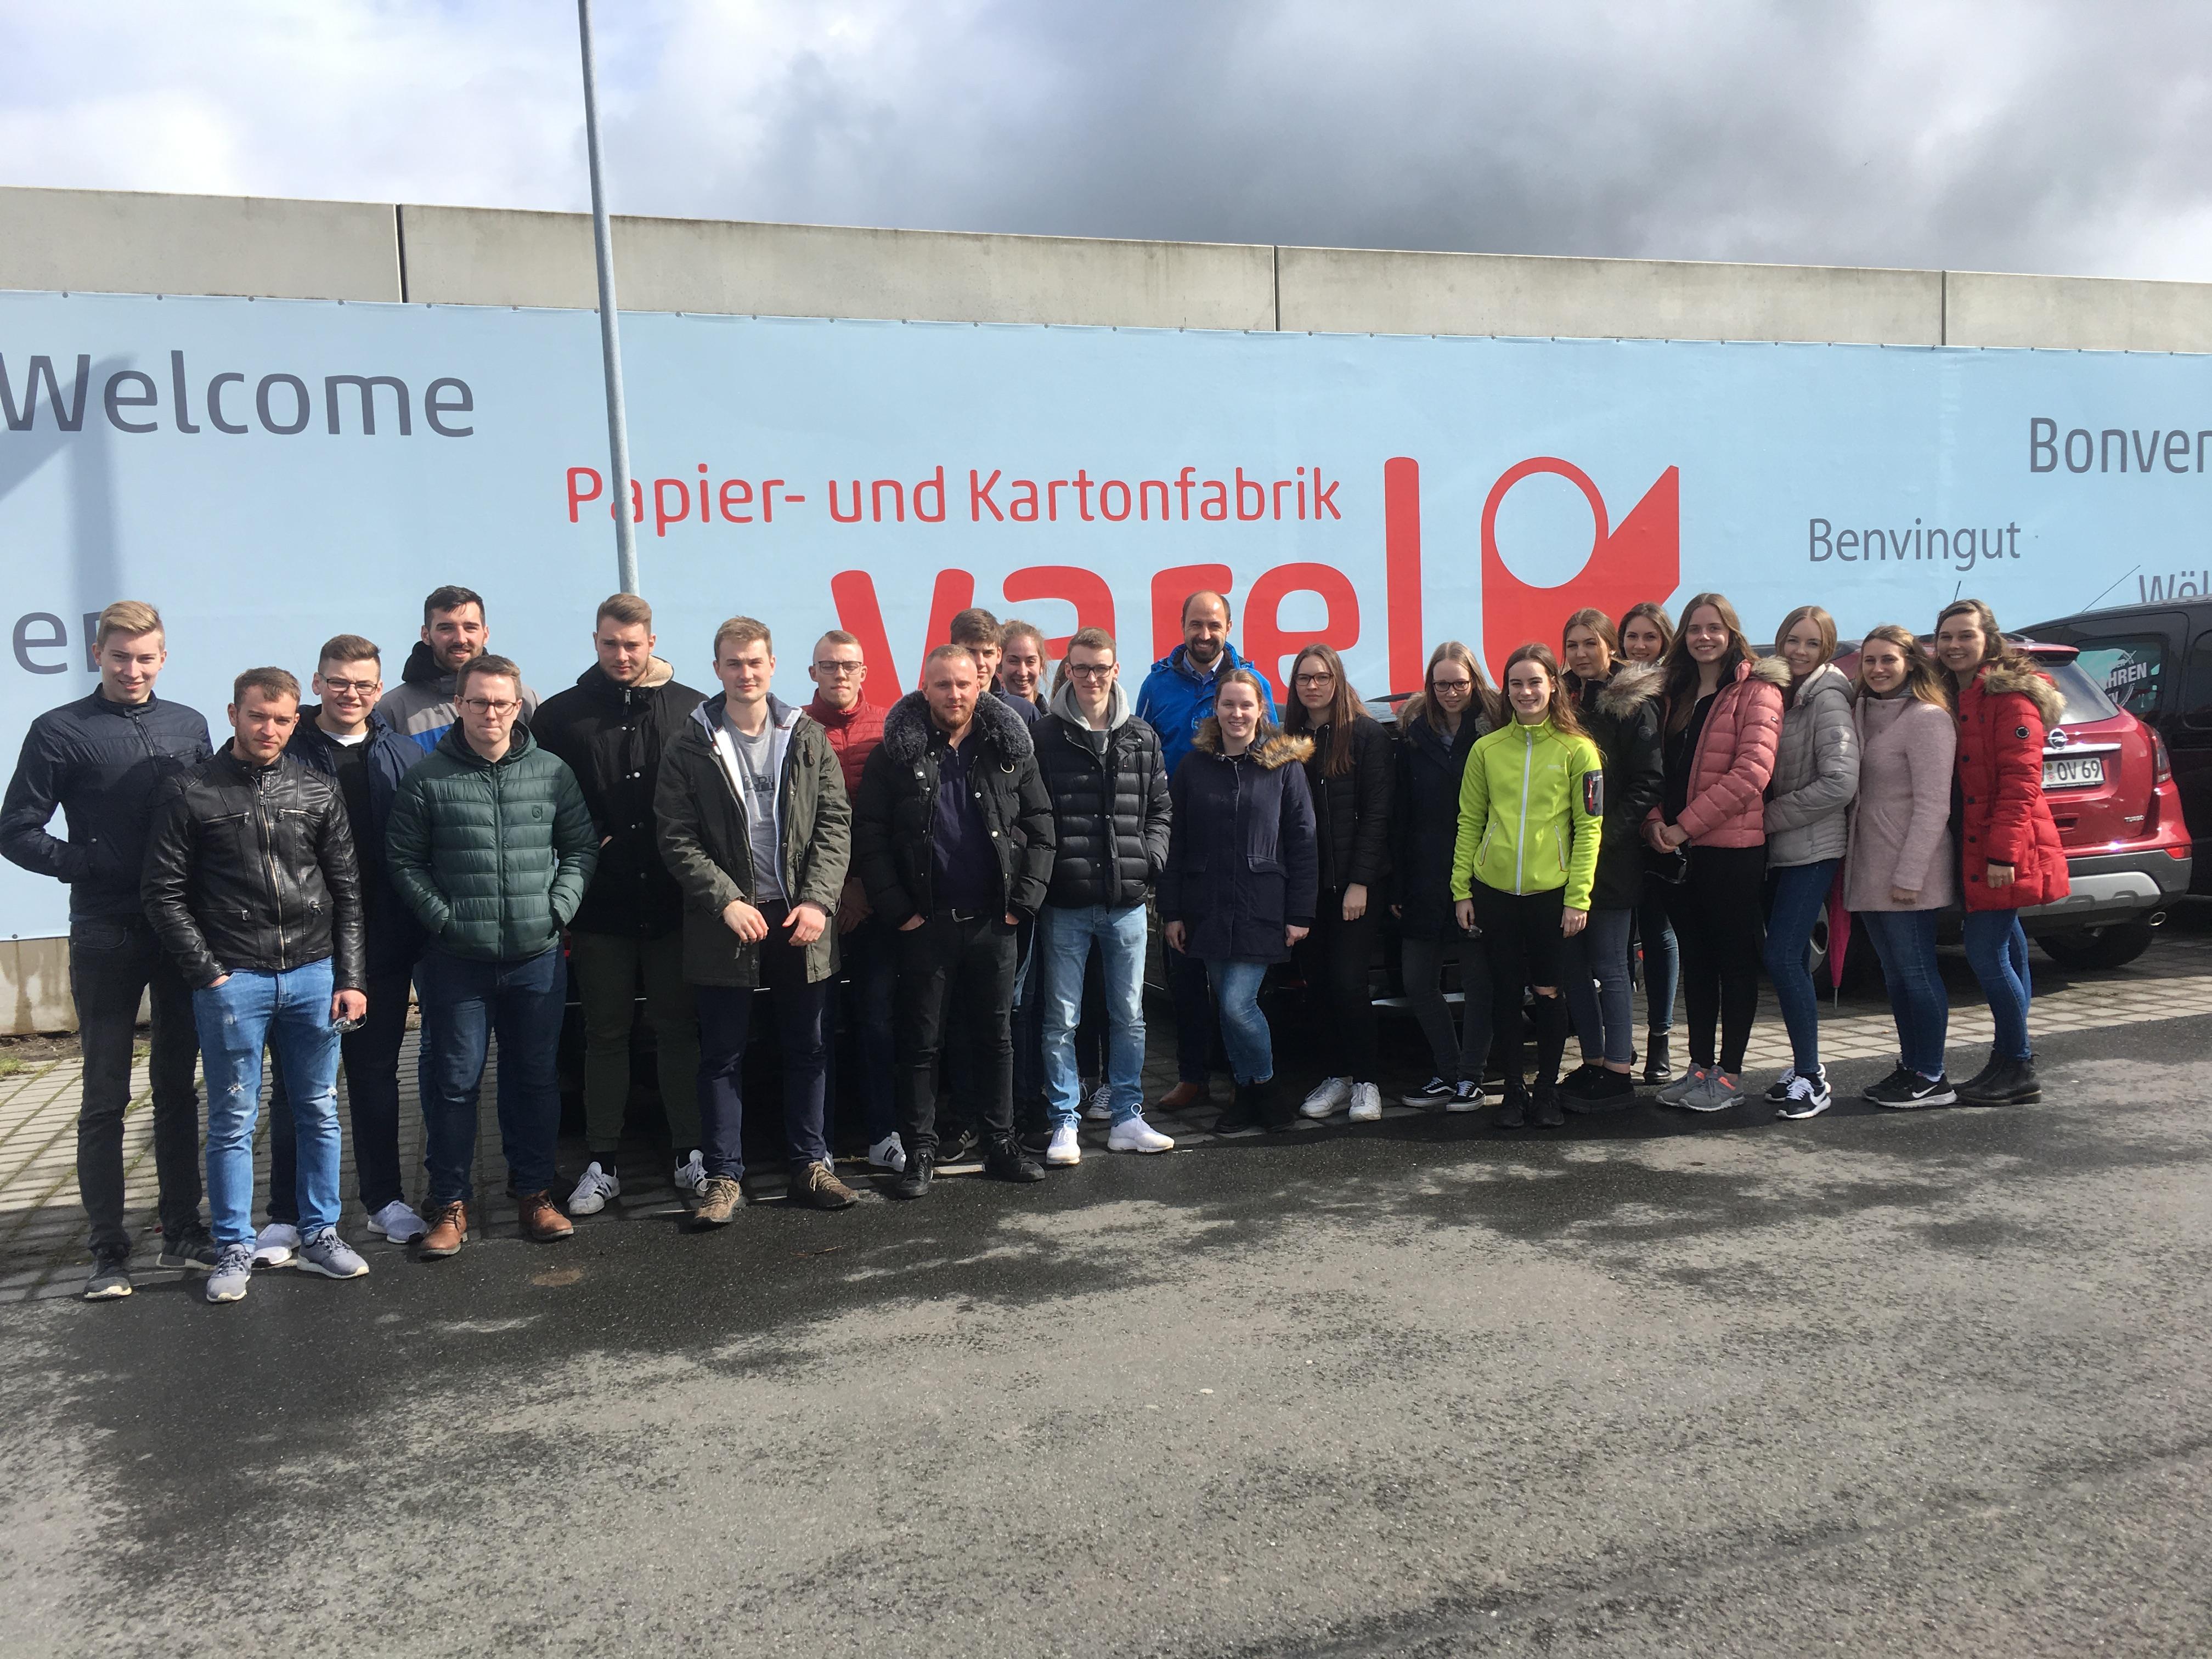 IK 1 besucht die Papier- und Kartonfabrik Varel (PKV)